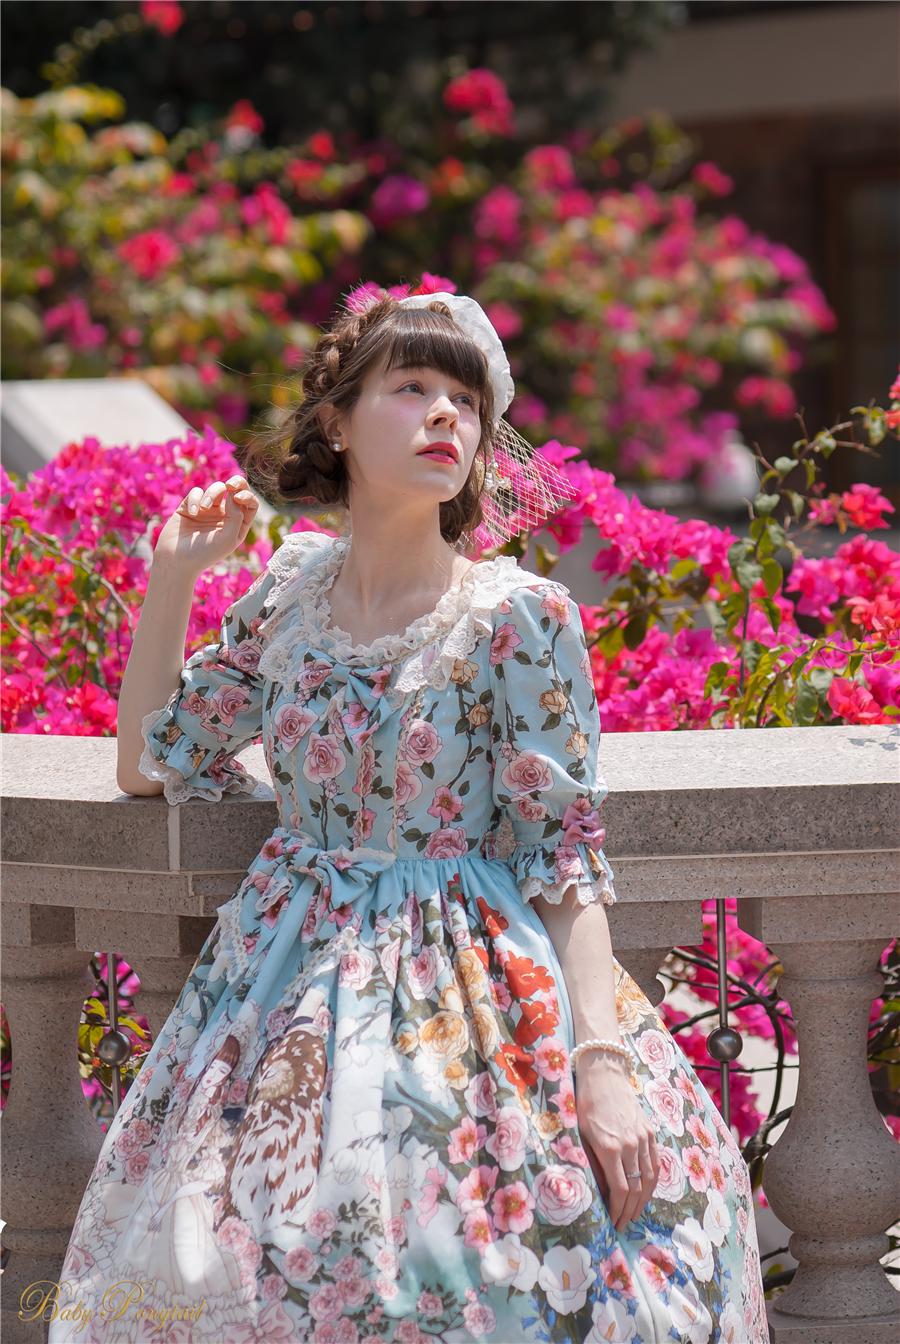 Baby Ponytail_Model Photo_Polly's Garden of Dreams_OP Lagoon Blue_Claudia_18.jpg